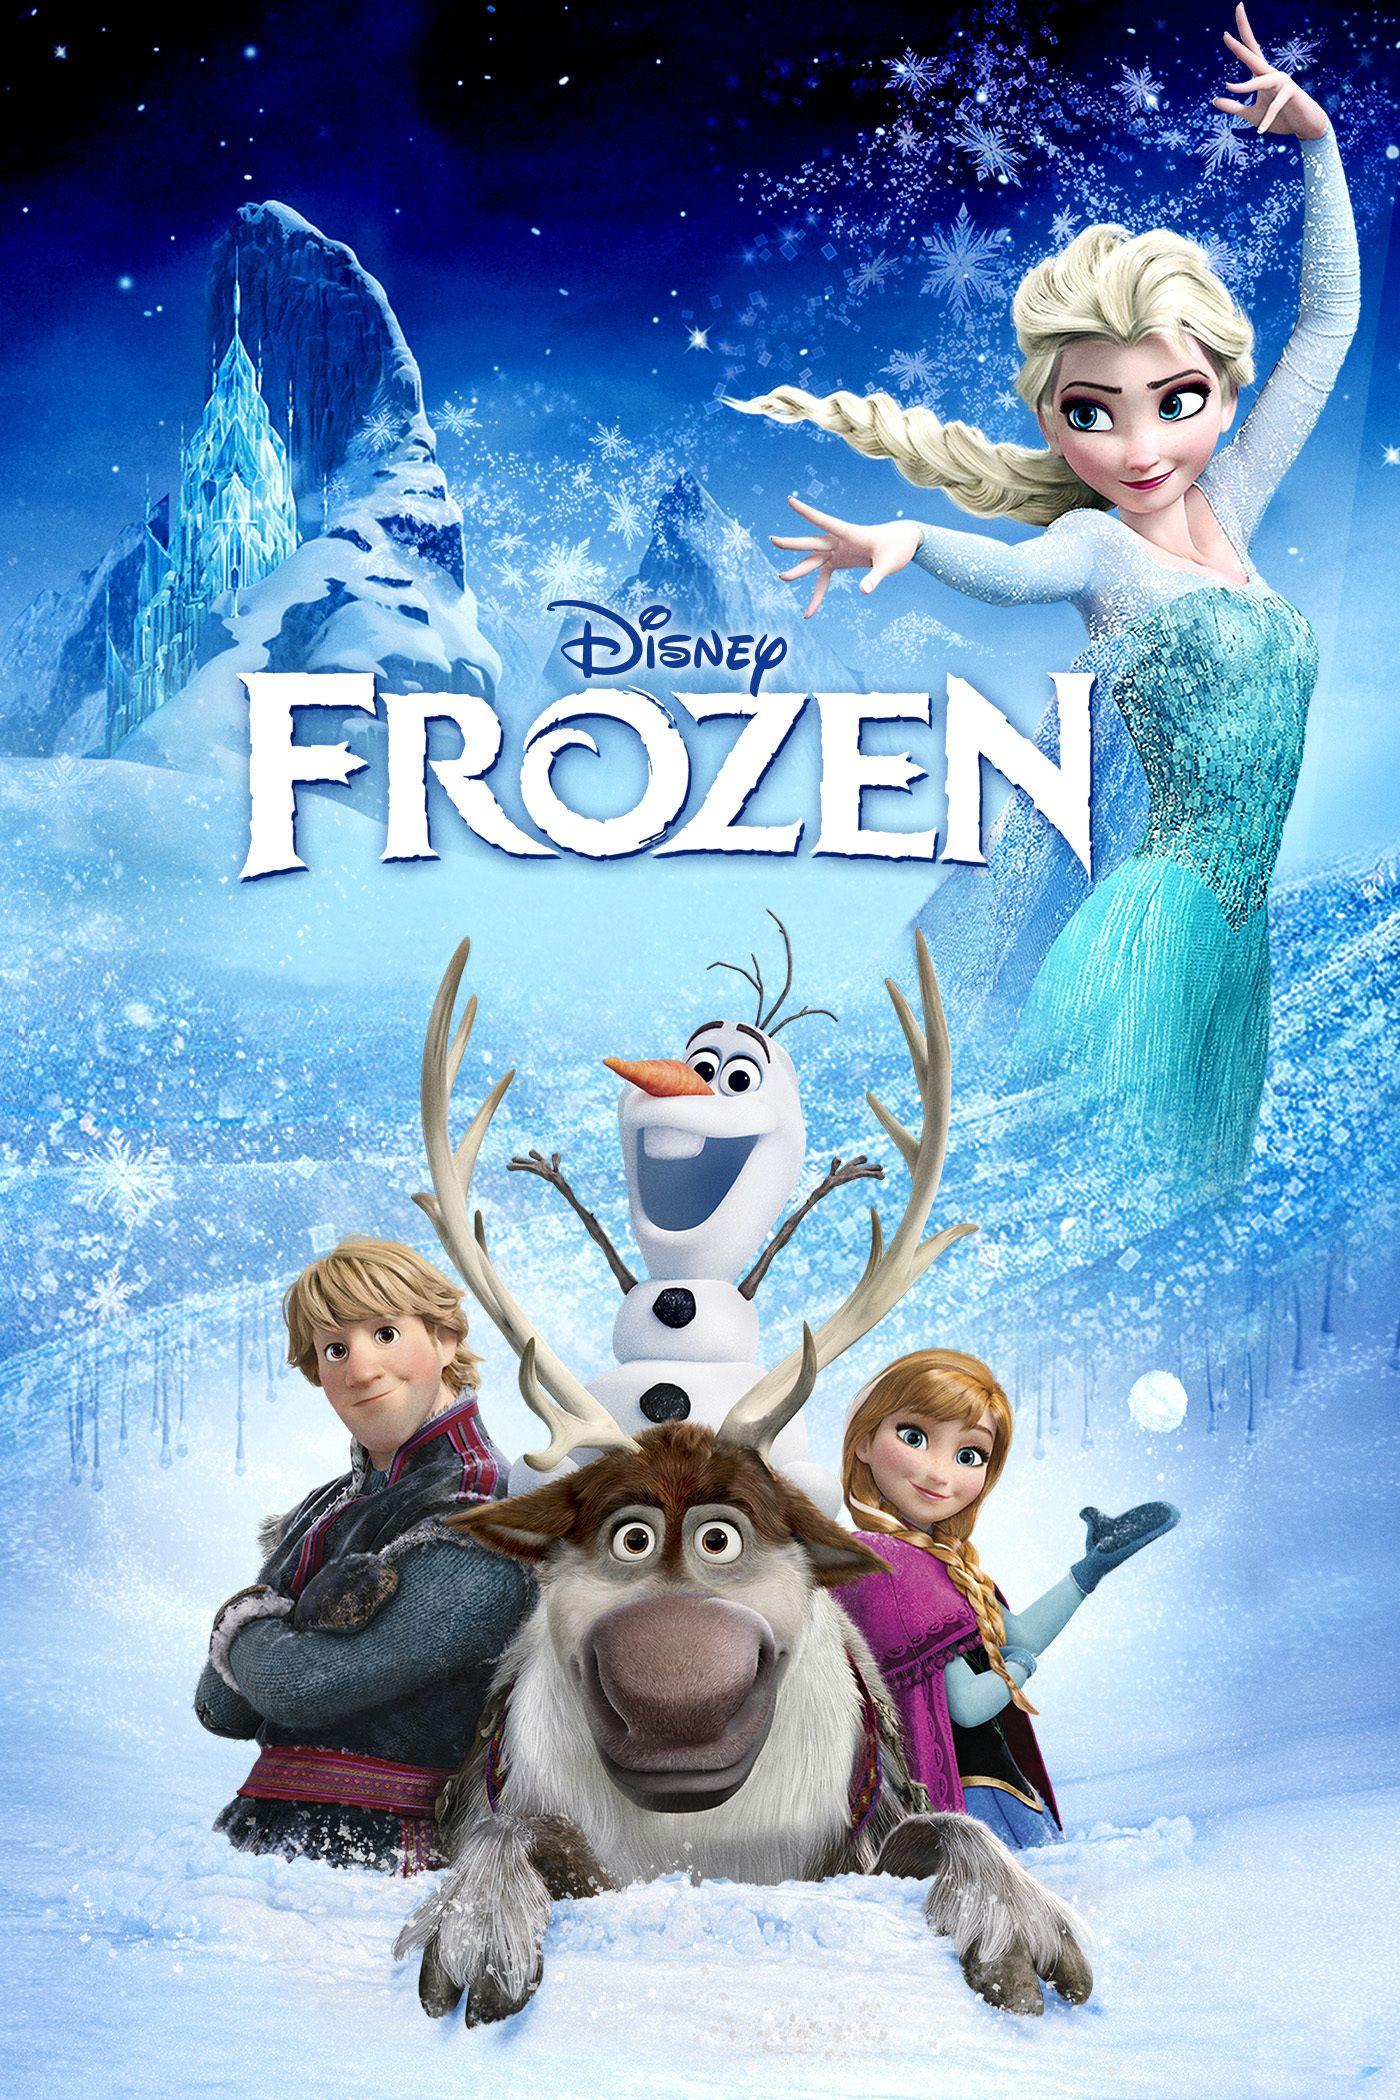 disney frozen movie cover Google Search Best disney